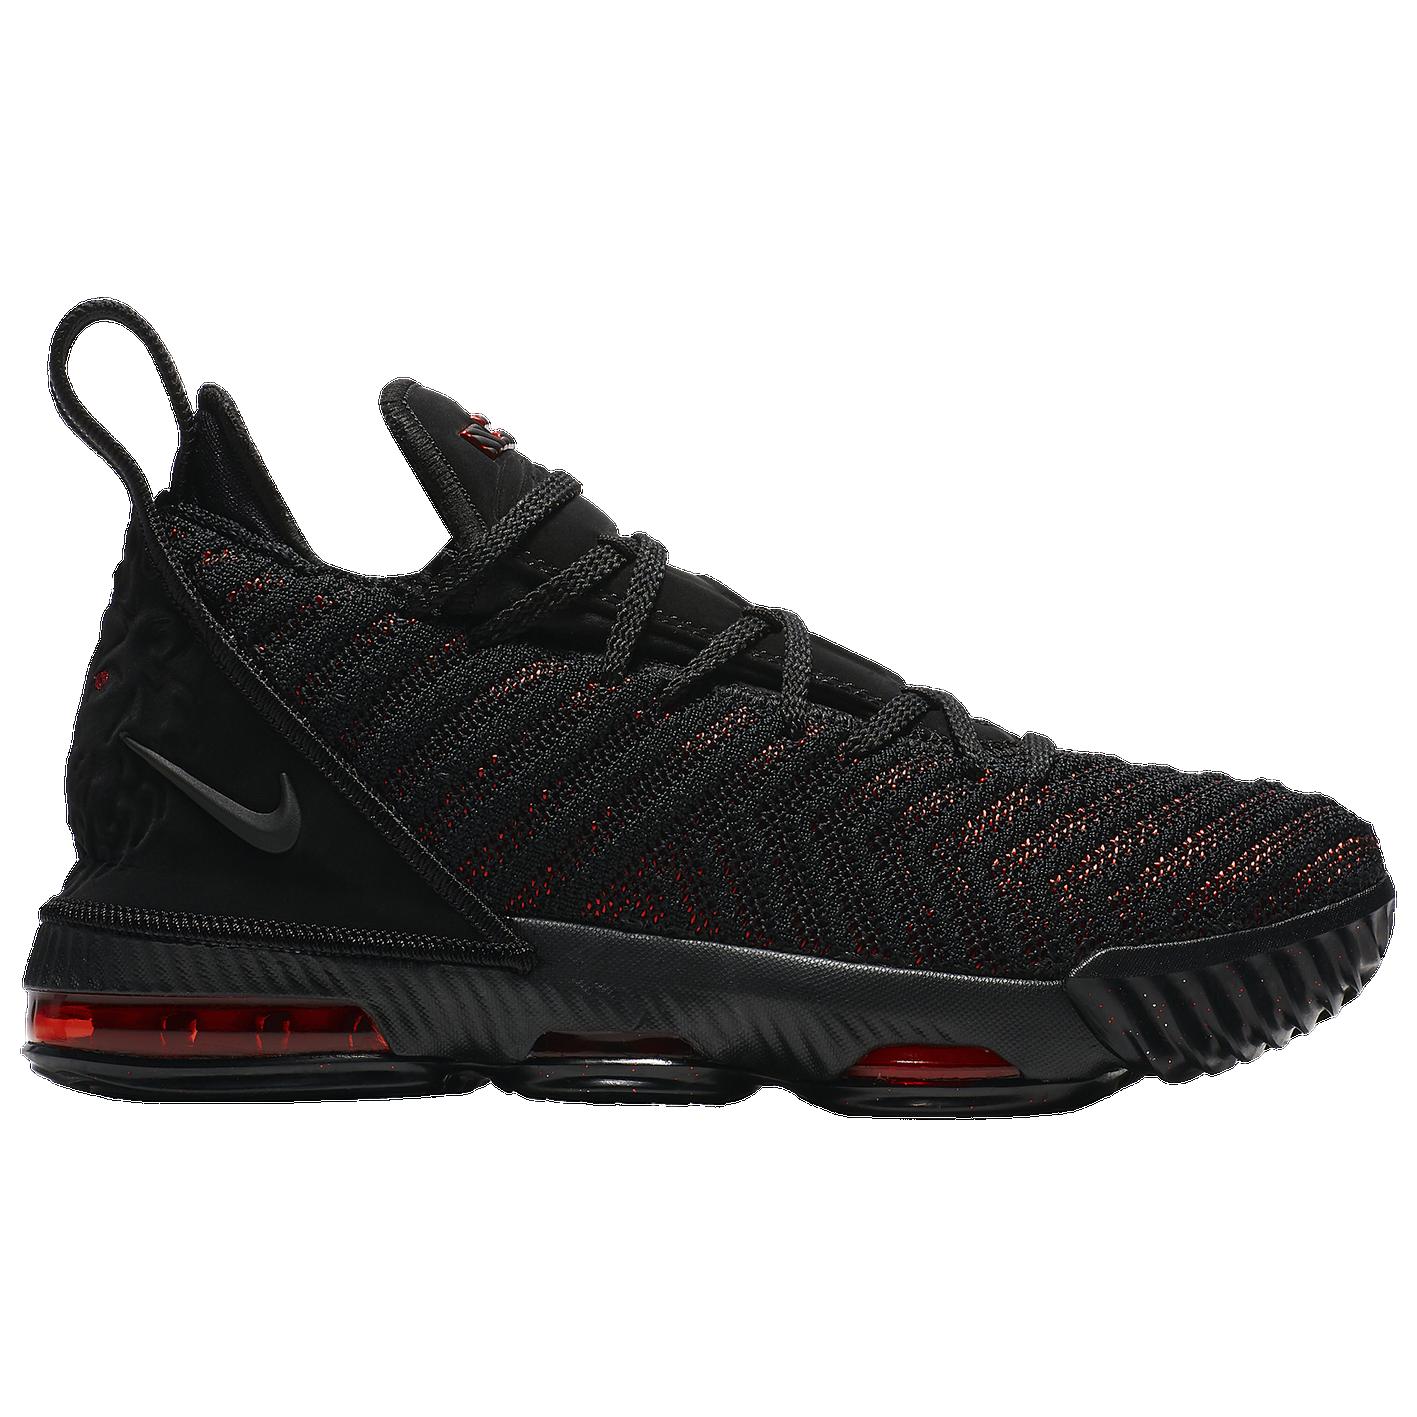 b9ce24c3562 Nike LeBron XVI - Boys  Grade School - Basketball - Shoes - James ...